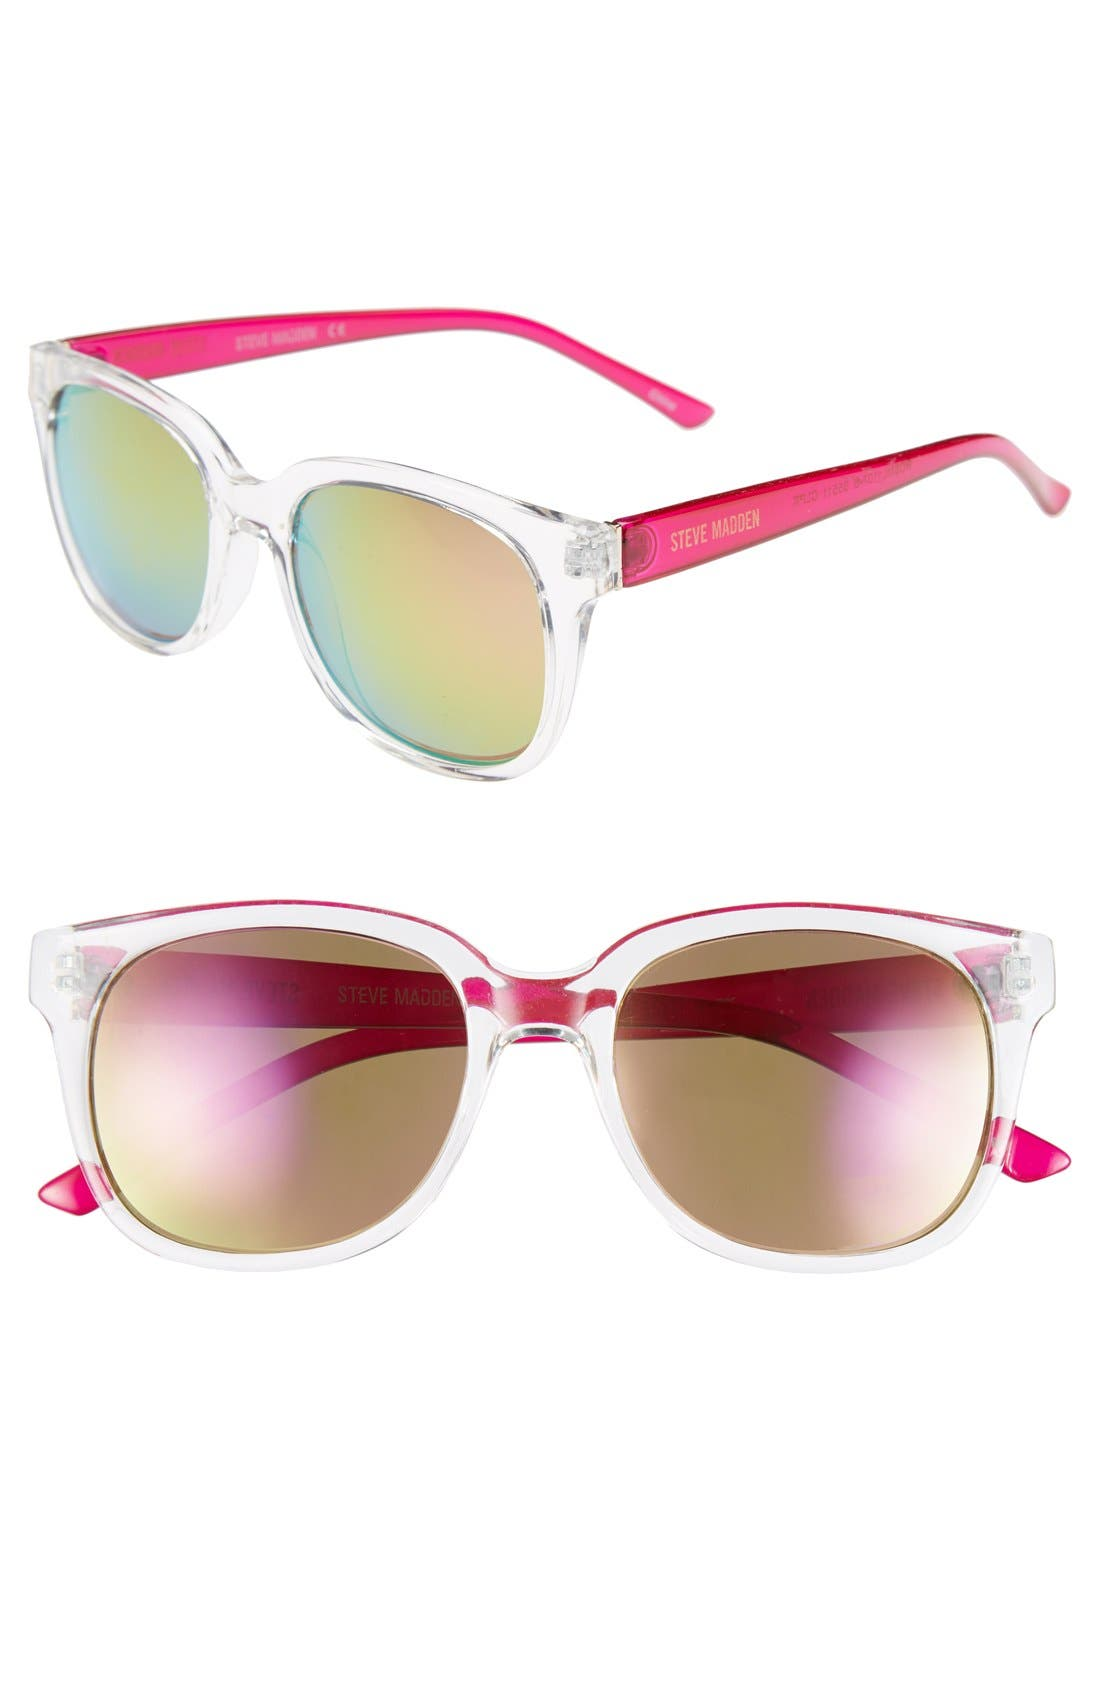 Main Image - Steve Madden 52mm Retro Sunglasses